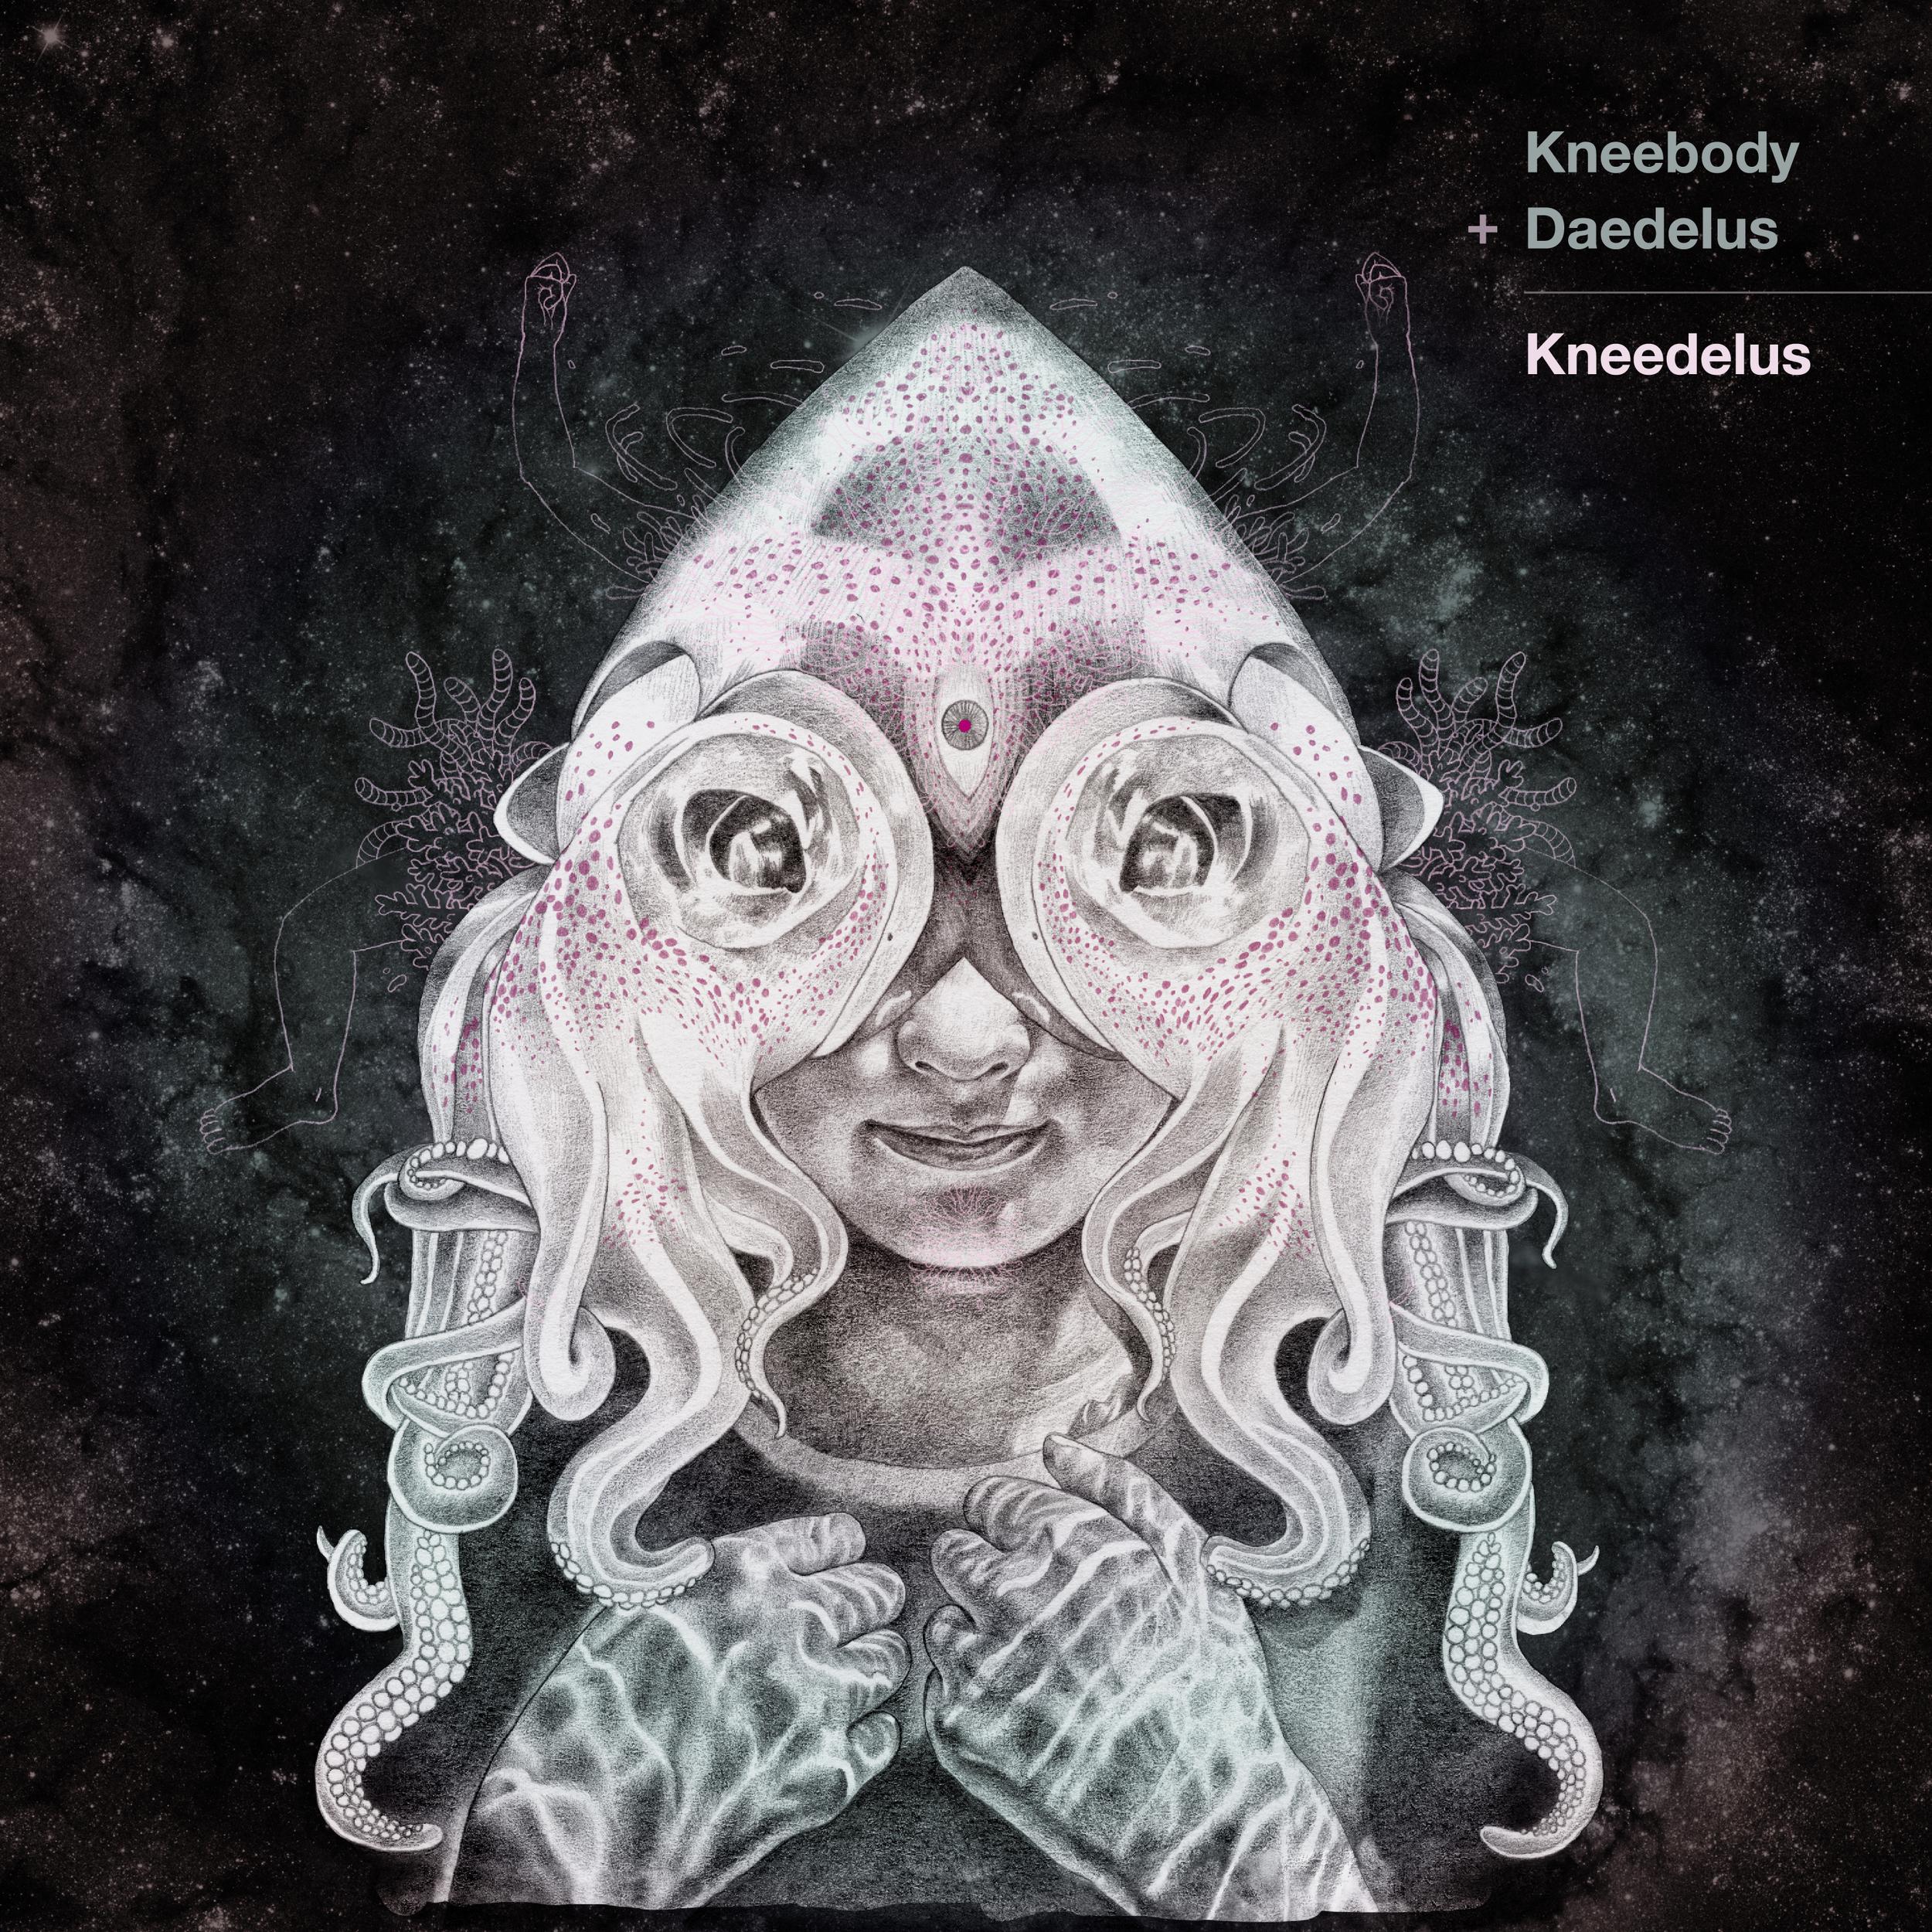 PHOTO CREDIT: Brainfeeder, Daedelus/Kneebody